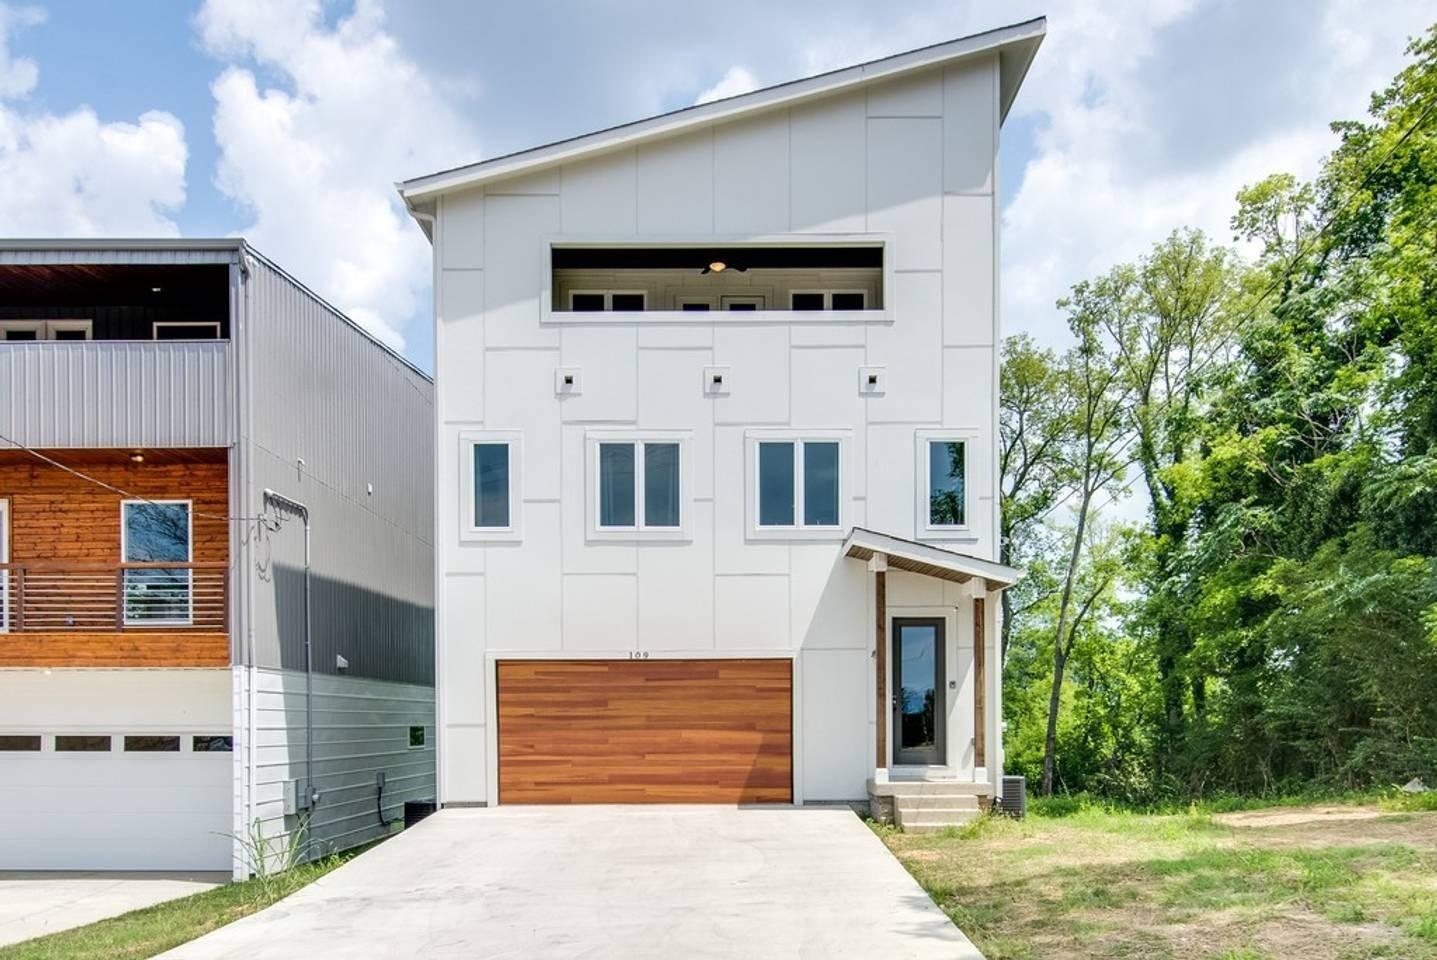 109 Fern Ave, Nashville, TN 37207 - Nashville, TN real estate listing